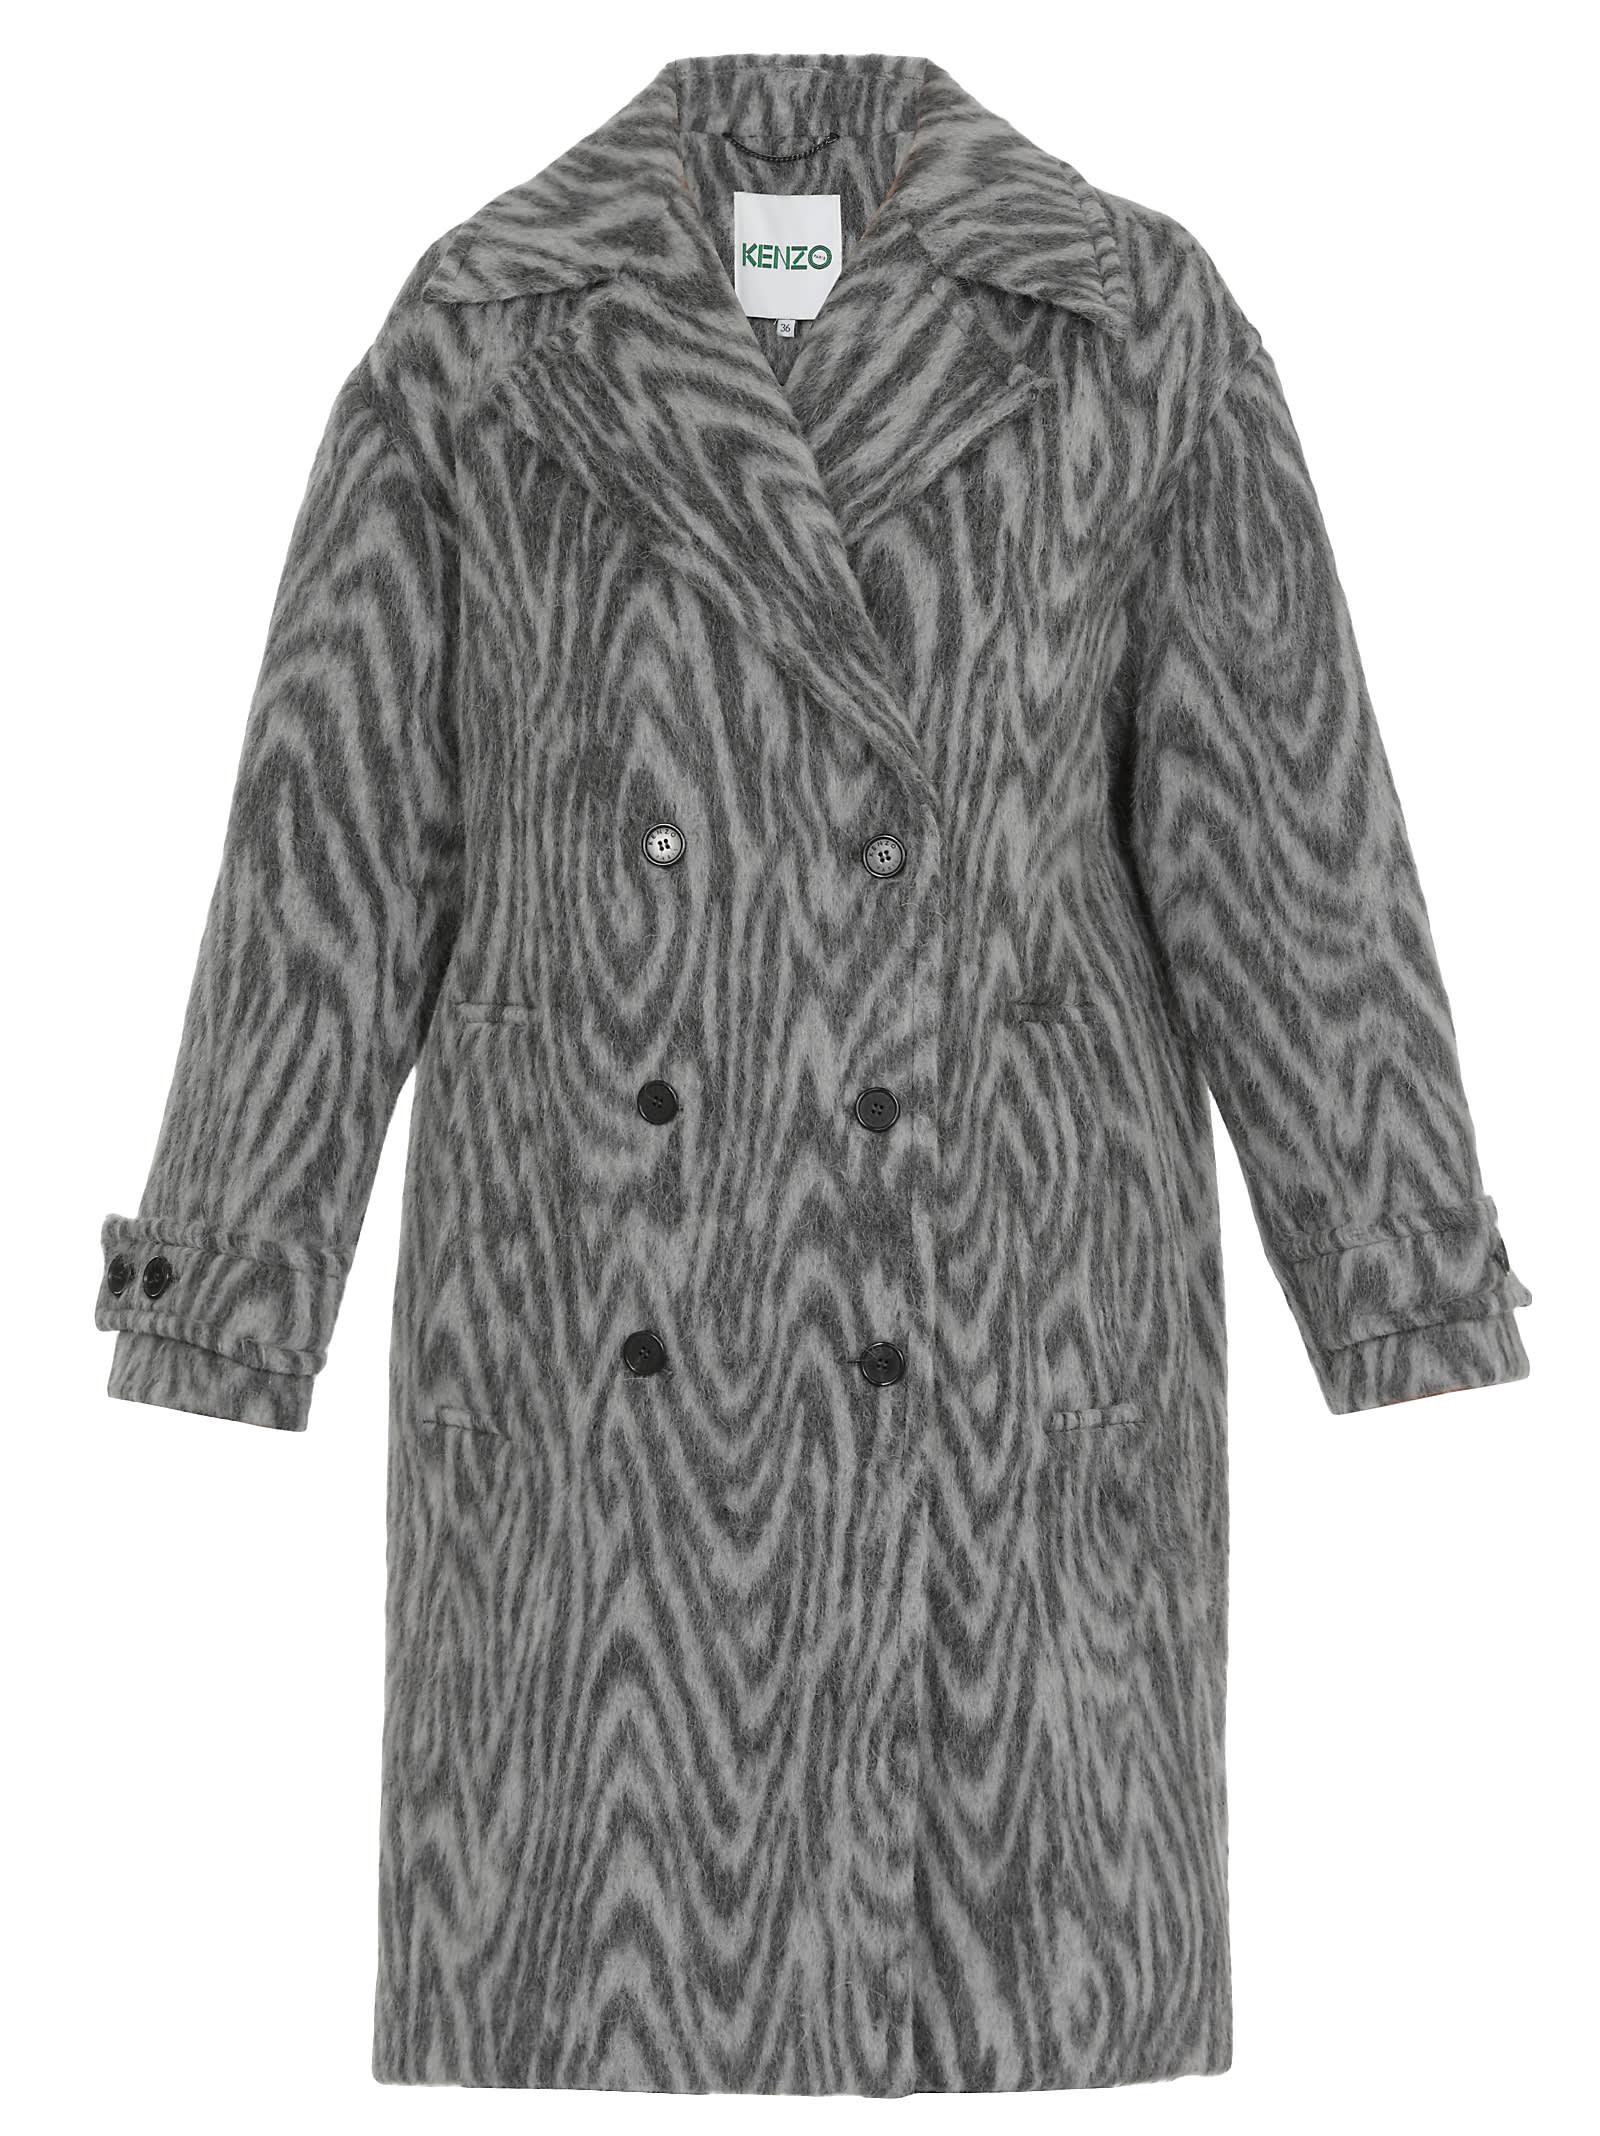 Kenzo Double-breasted Coat